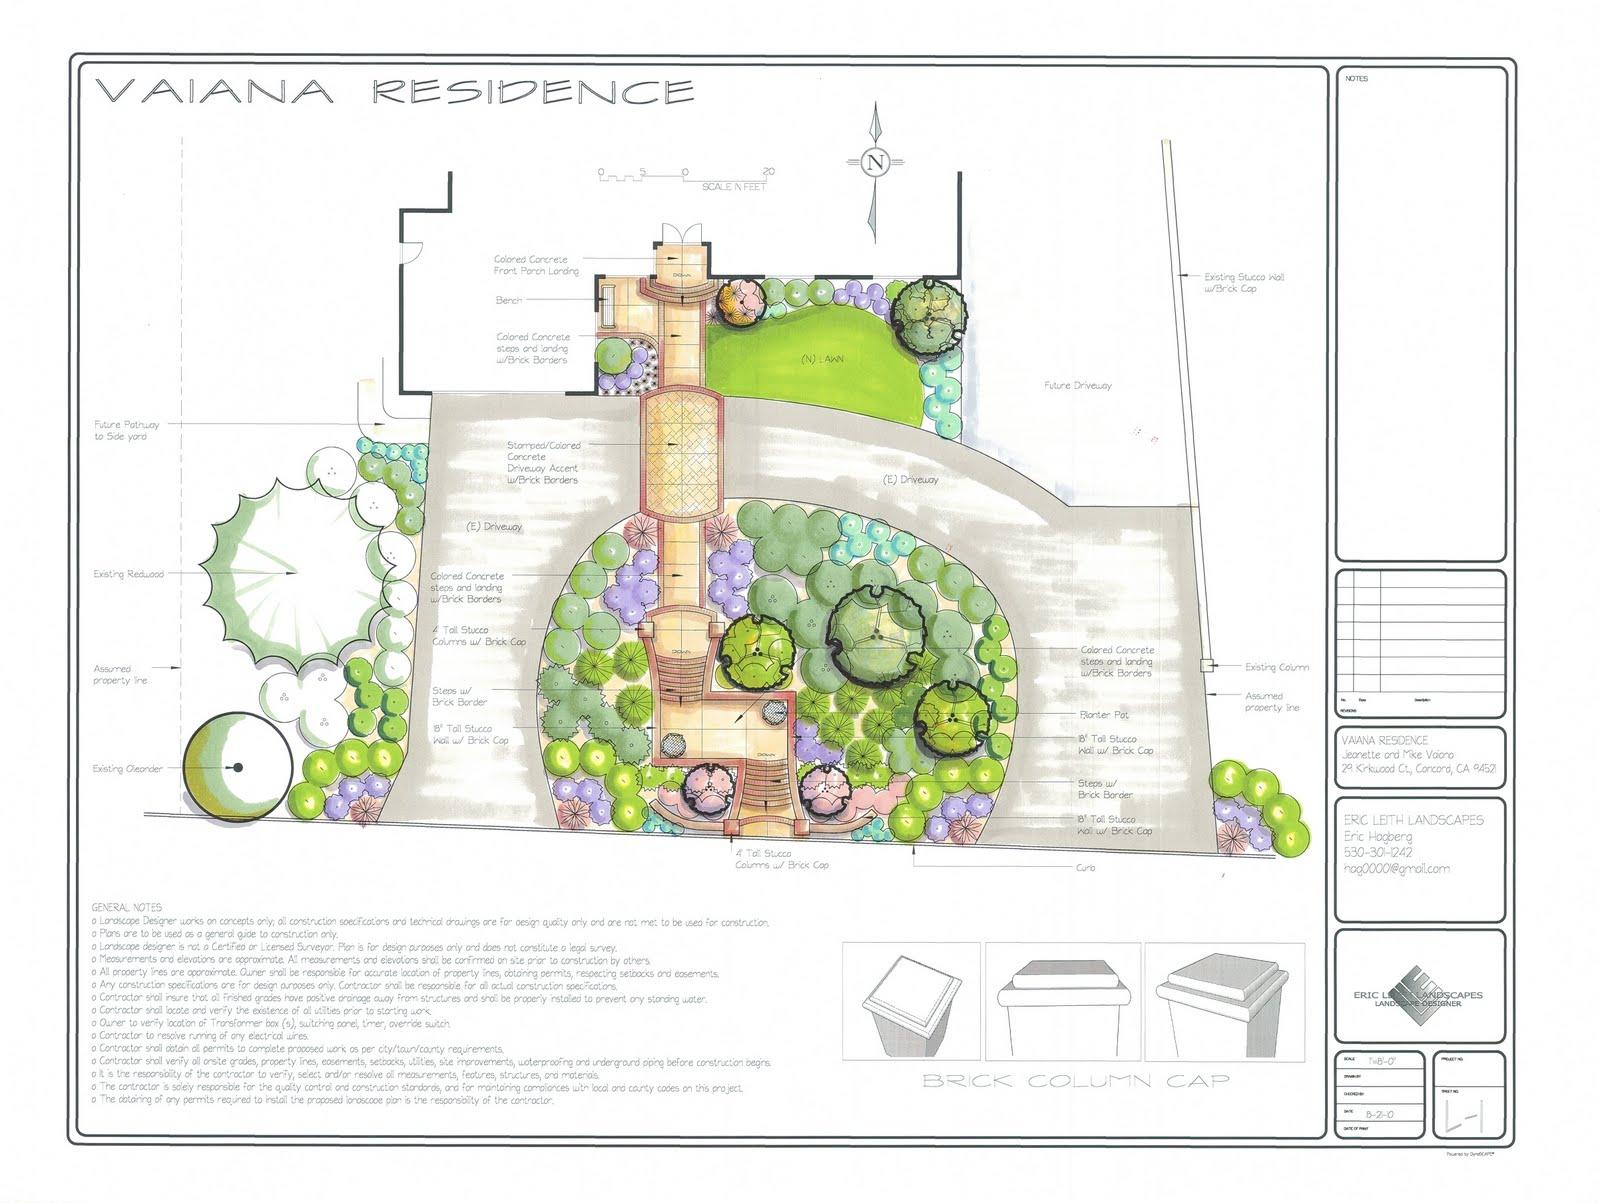 Circle driveway landscaping on pinterest driveway for Semi circle driveway designs